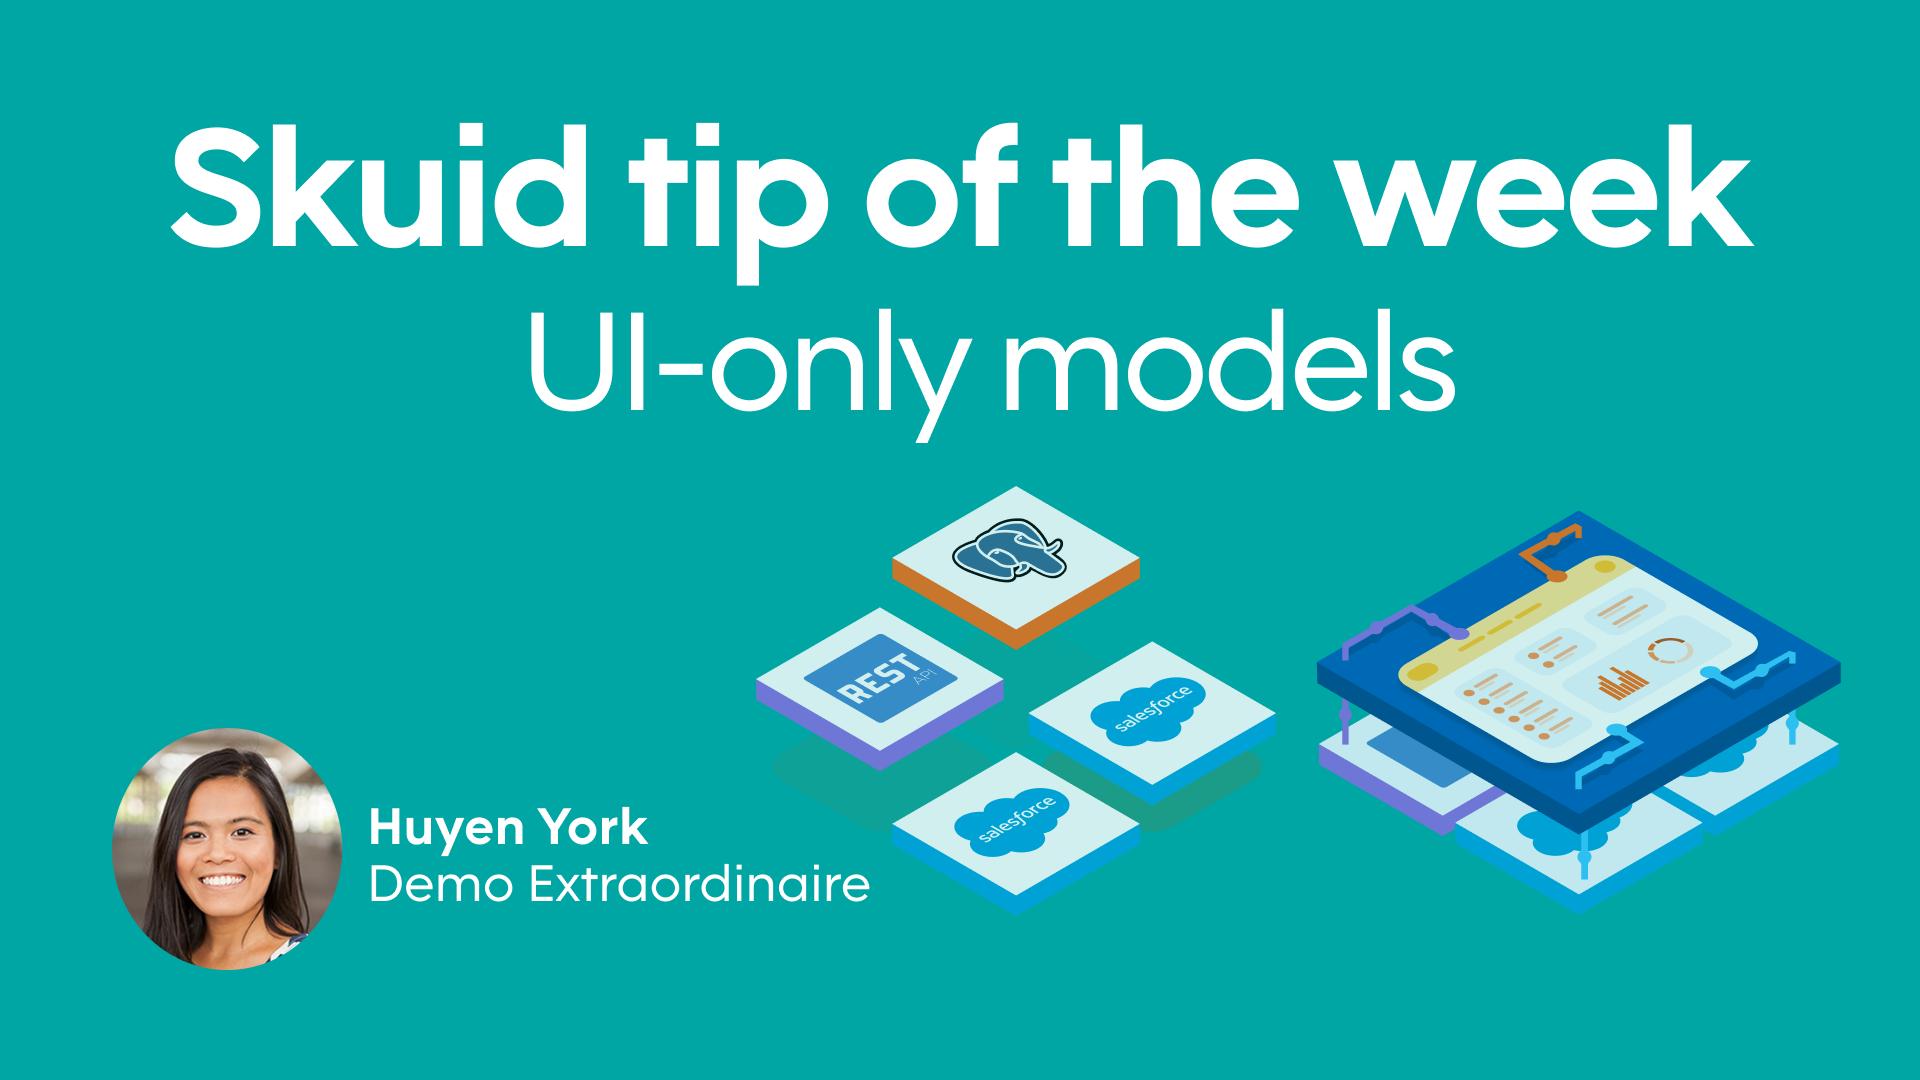 UI-only models | Skuid tip of the week - Huyen York, Demo Extraordinaire